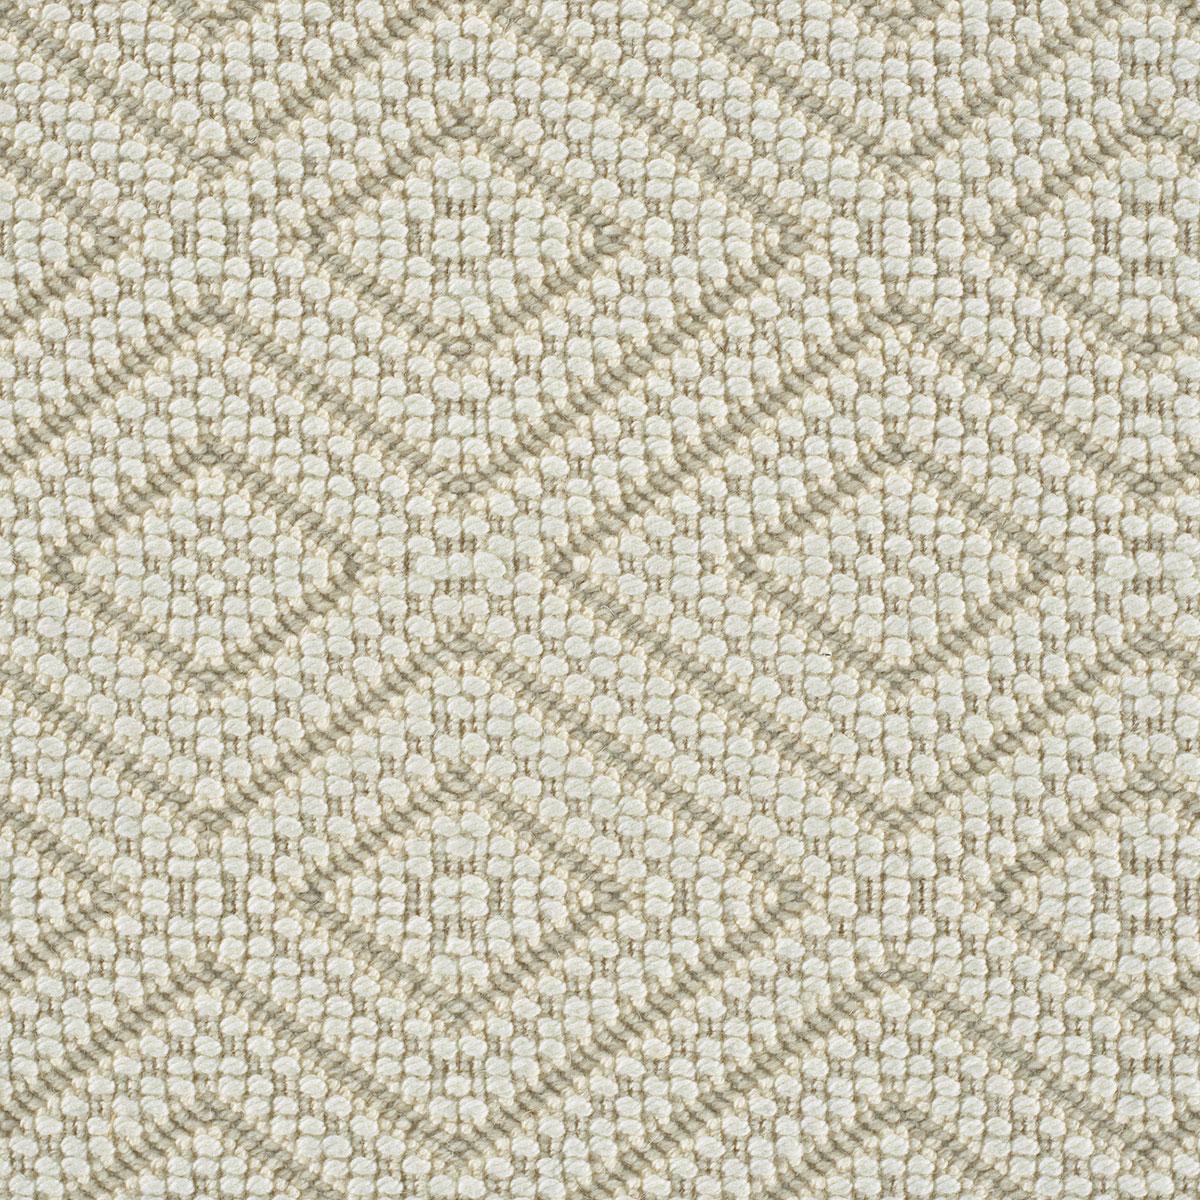 Argento J Mish Mills Wool Carpet Rugs